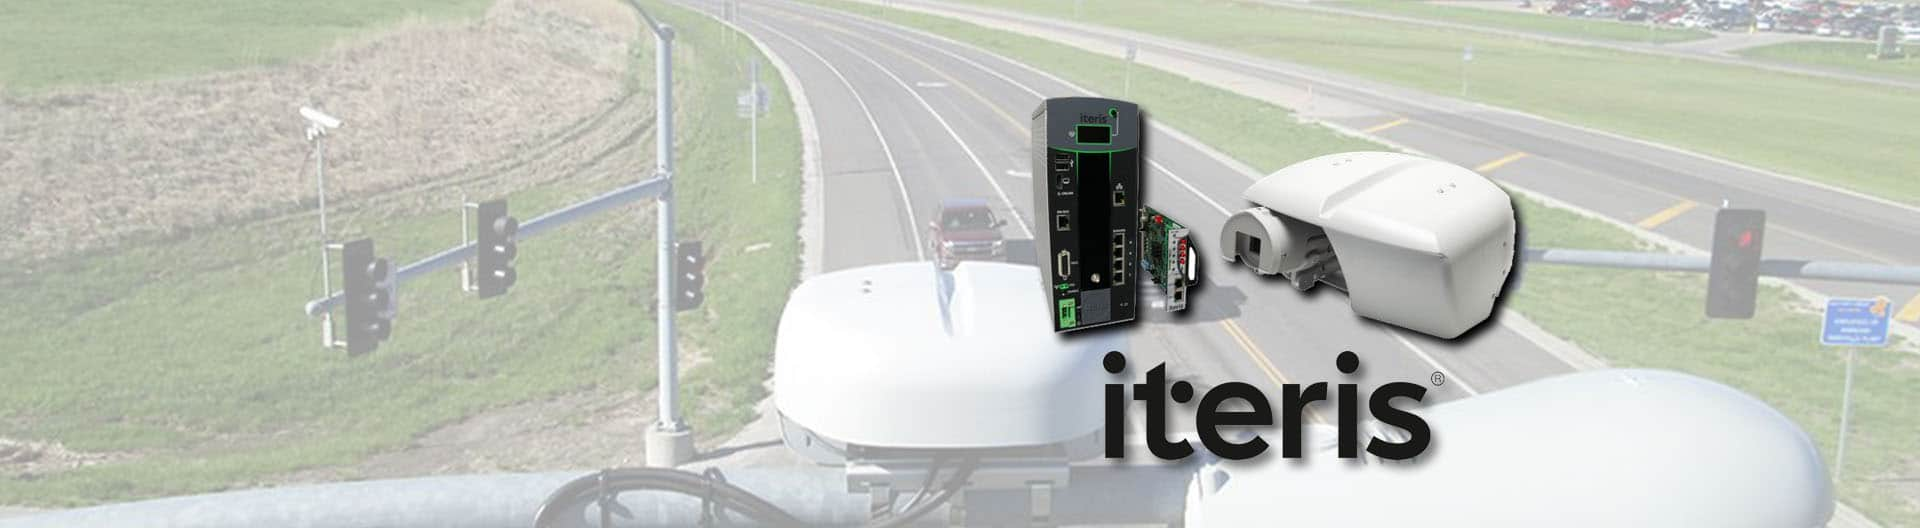 iteris traffic control brand